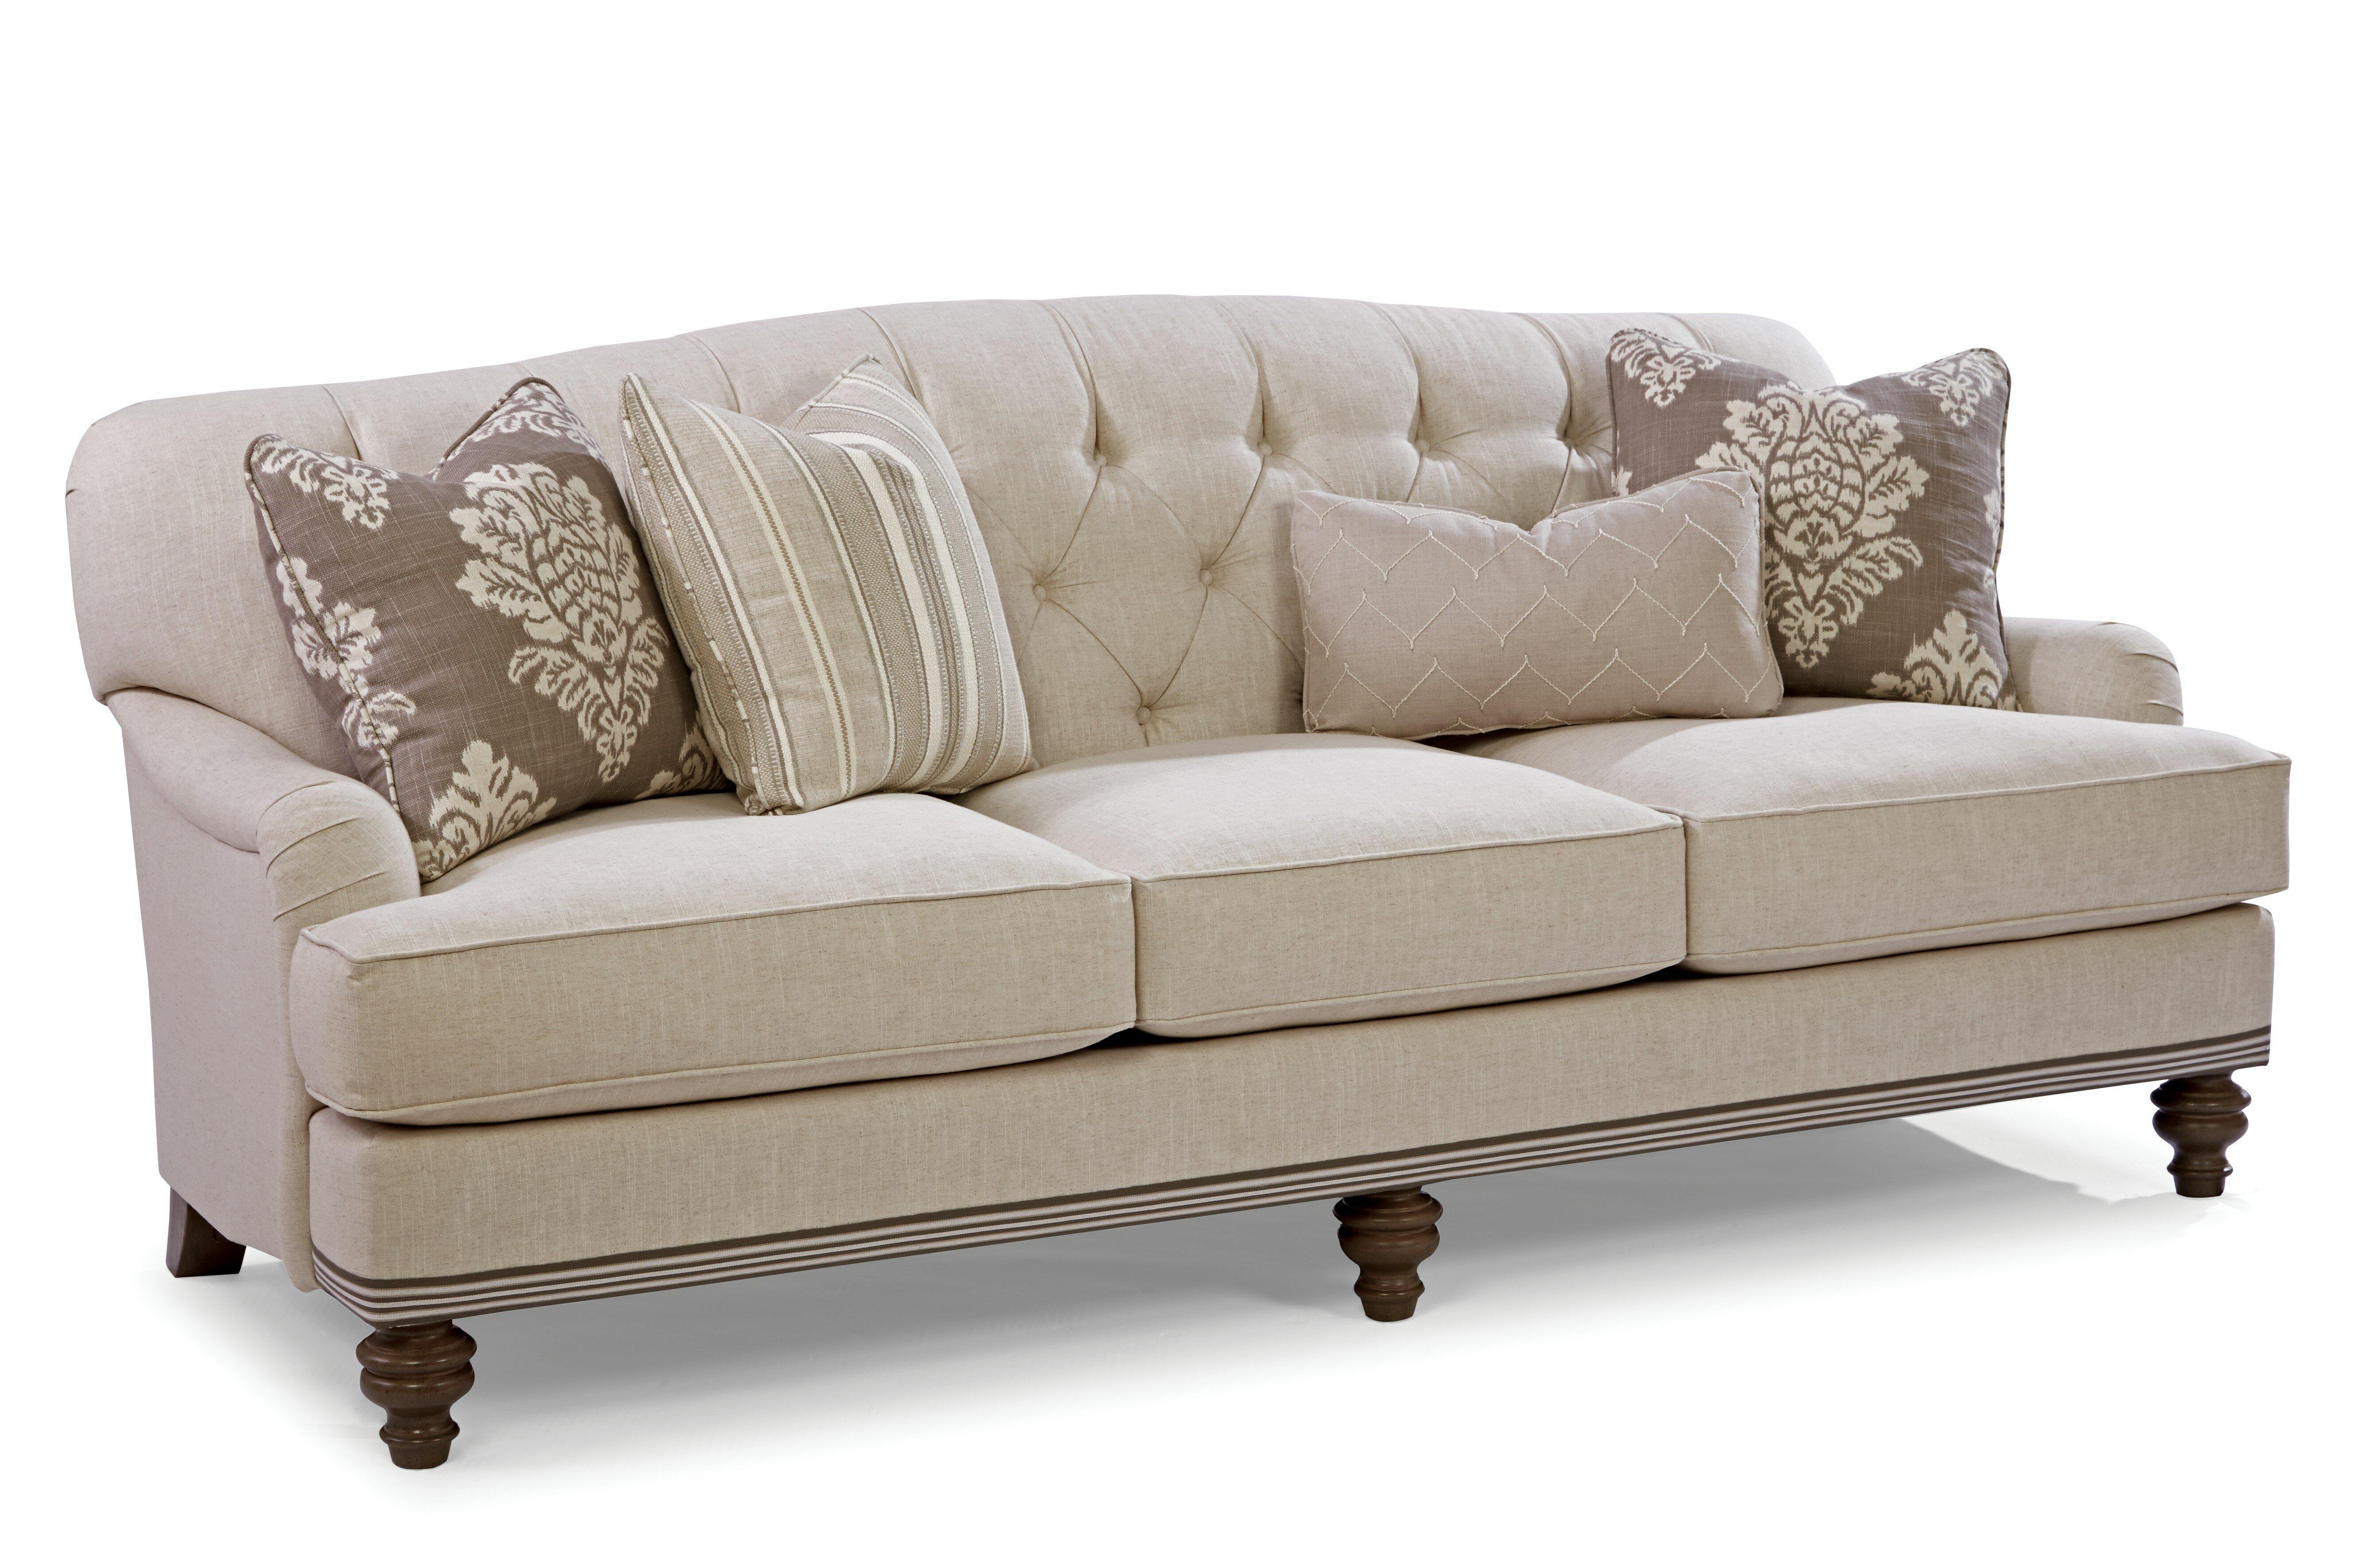 Paula Deen Home Kendall Sofa U0026 Reviews | Wayfair